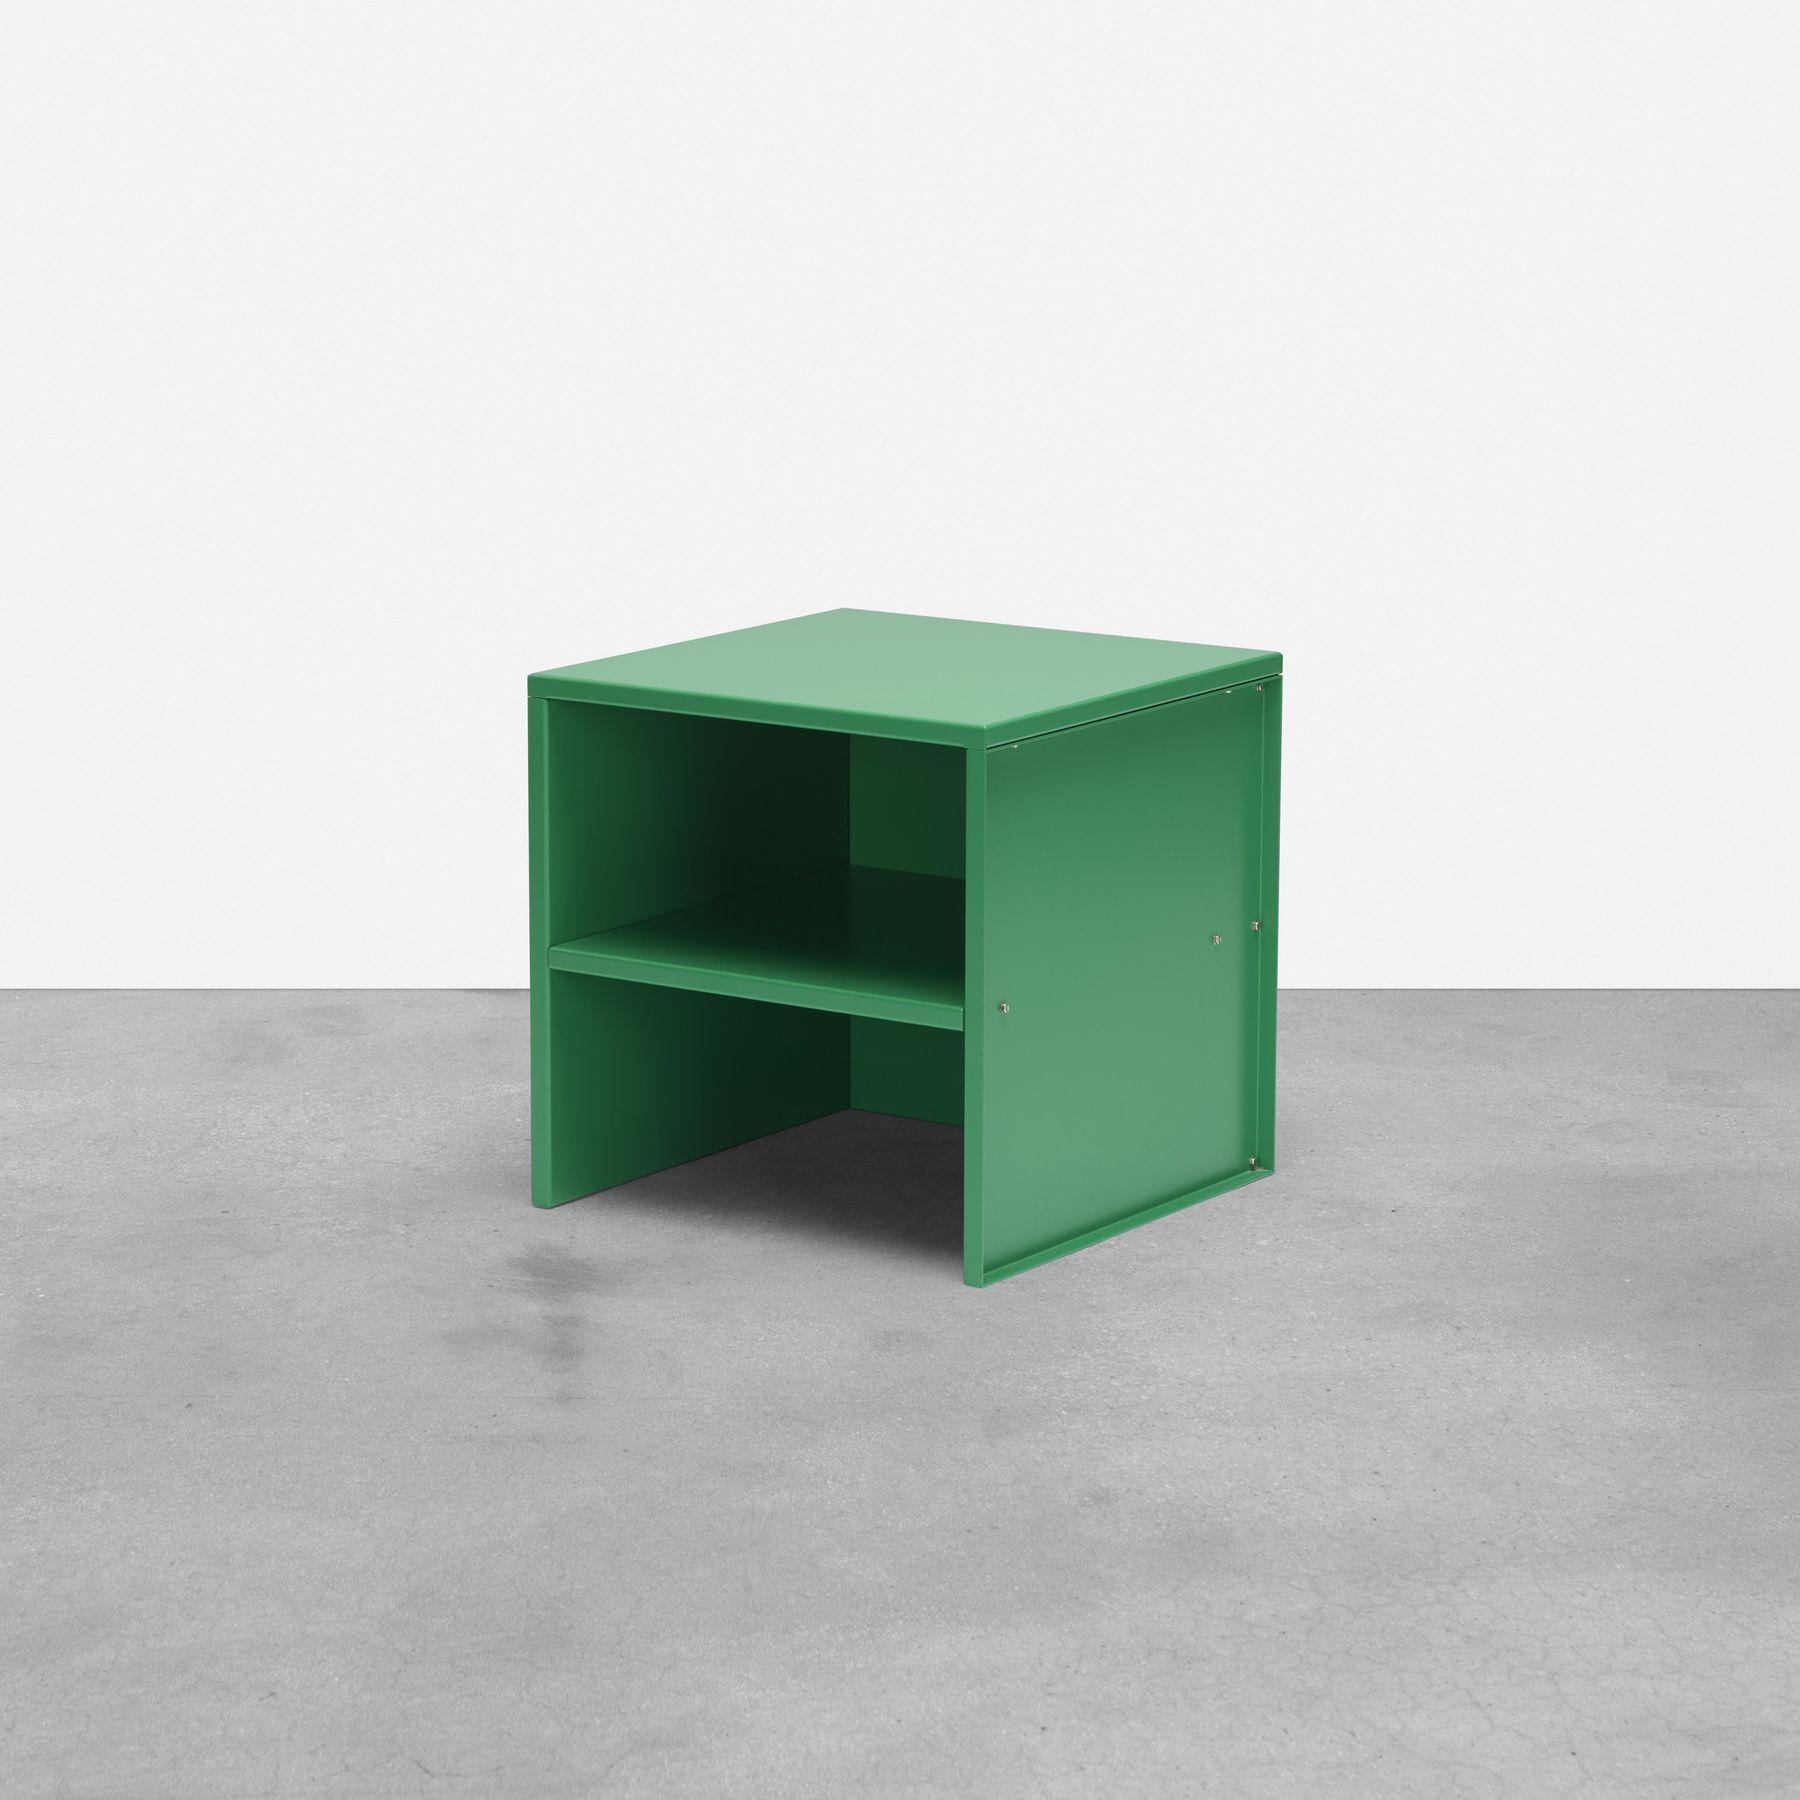 Donald Judd No 5 Stool Wright20 Com Donald Judd Stool Furniture